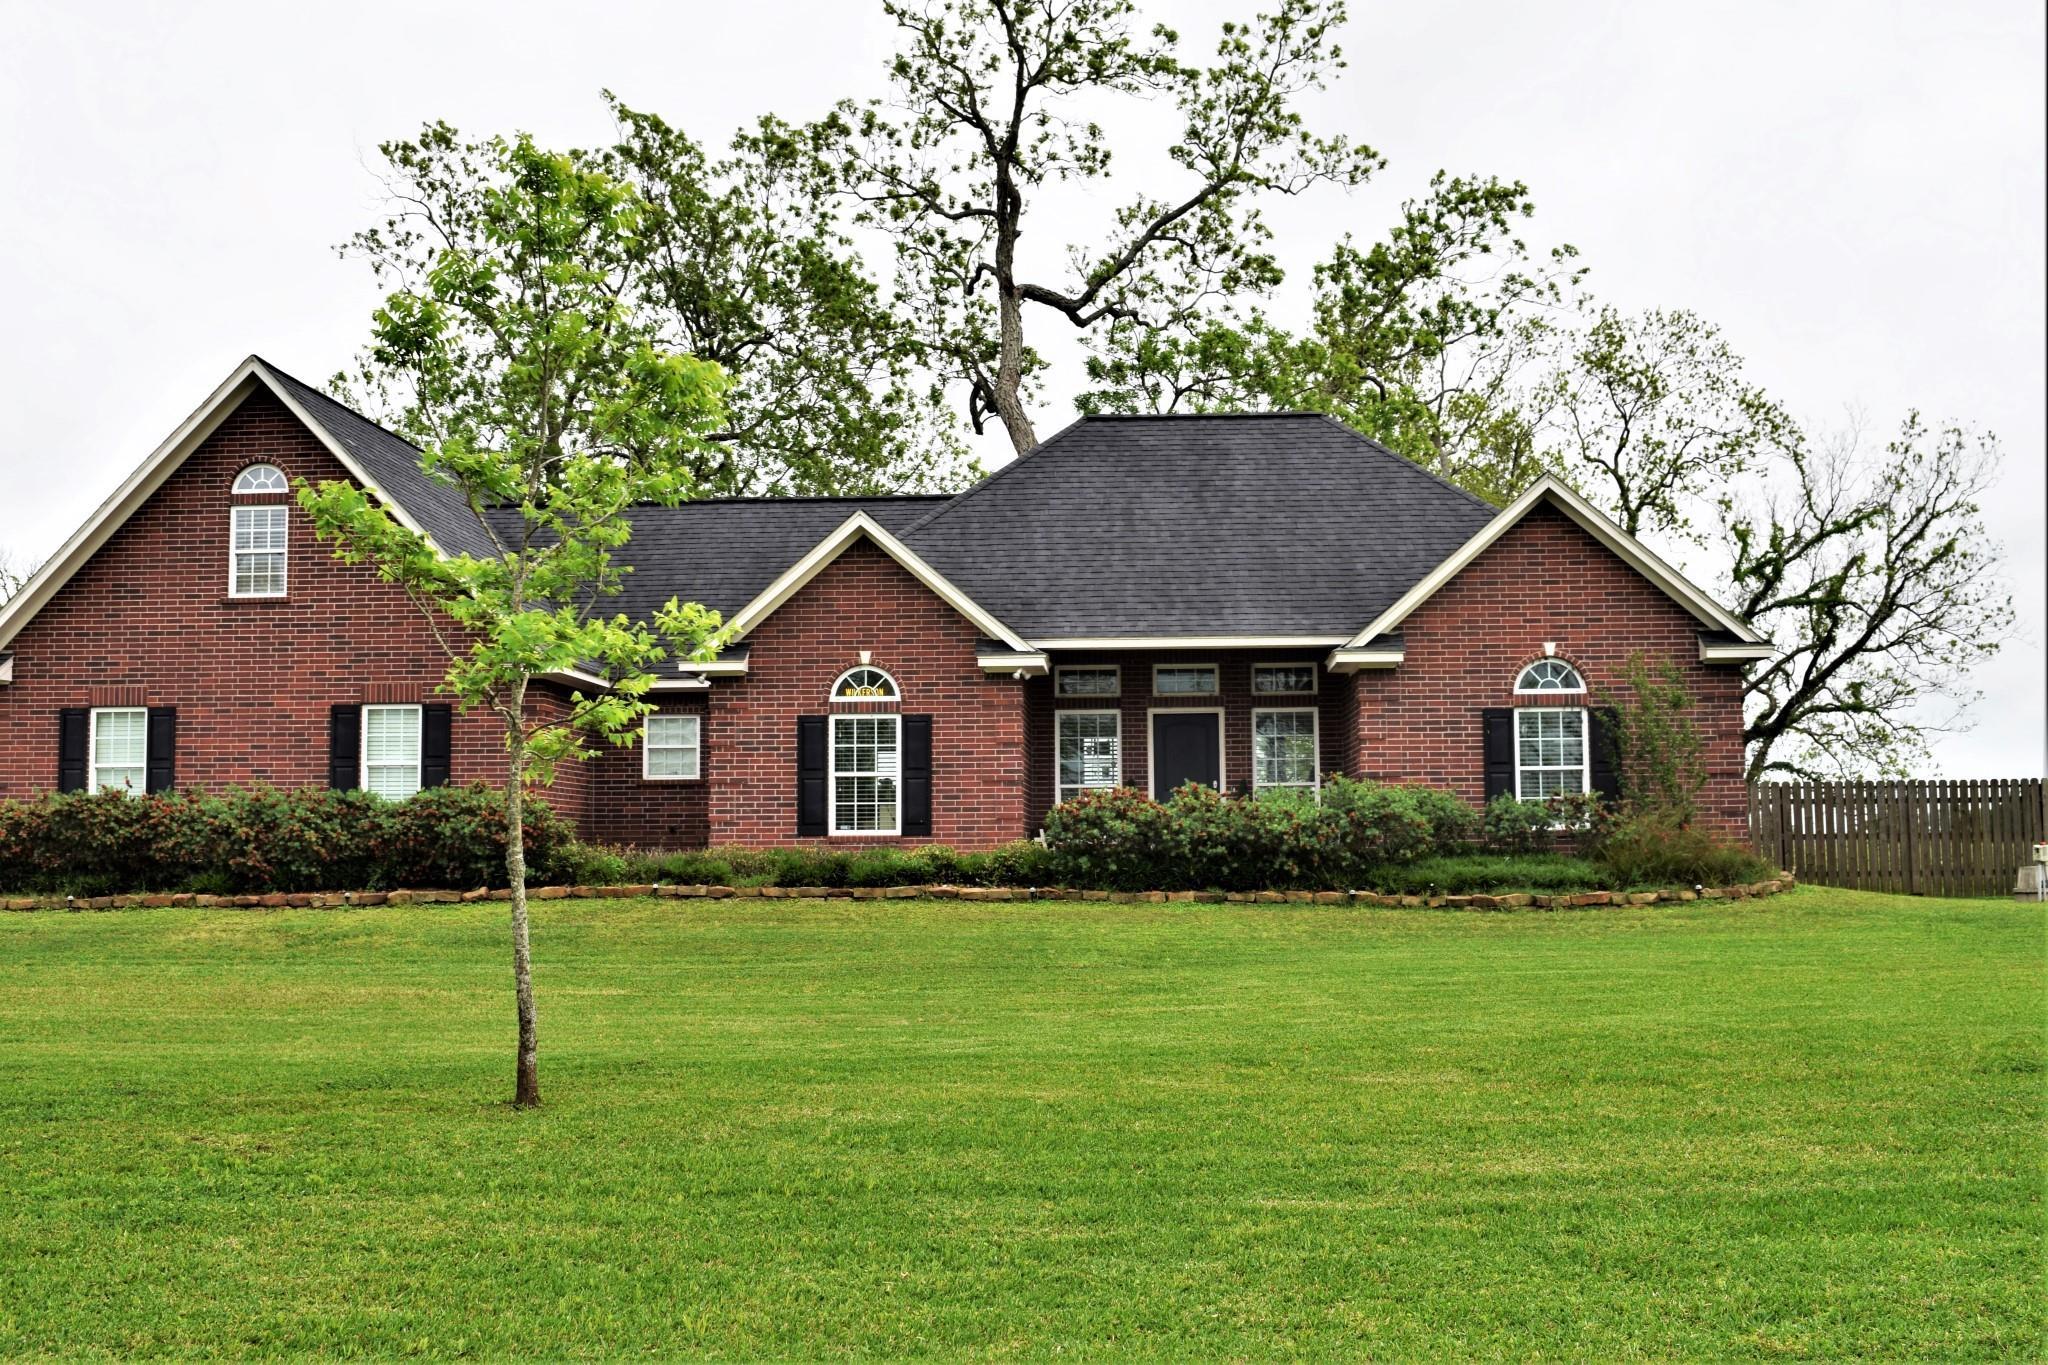 7030 Fm 457 Property Photo - Bay City, TX real estate listing